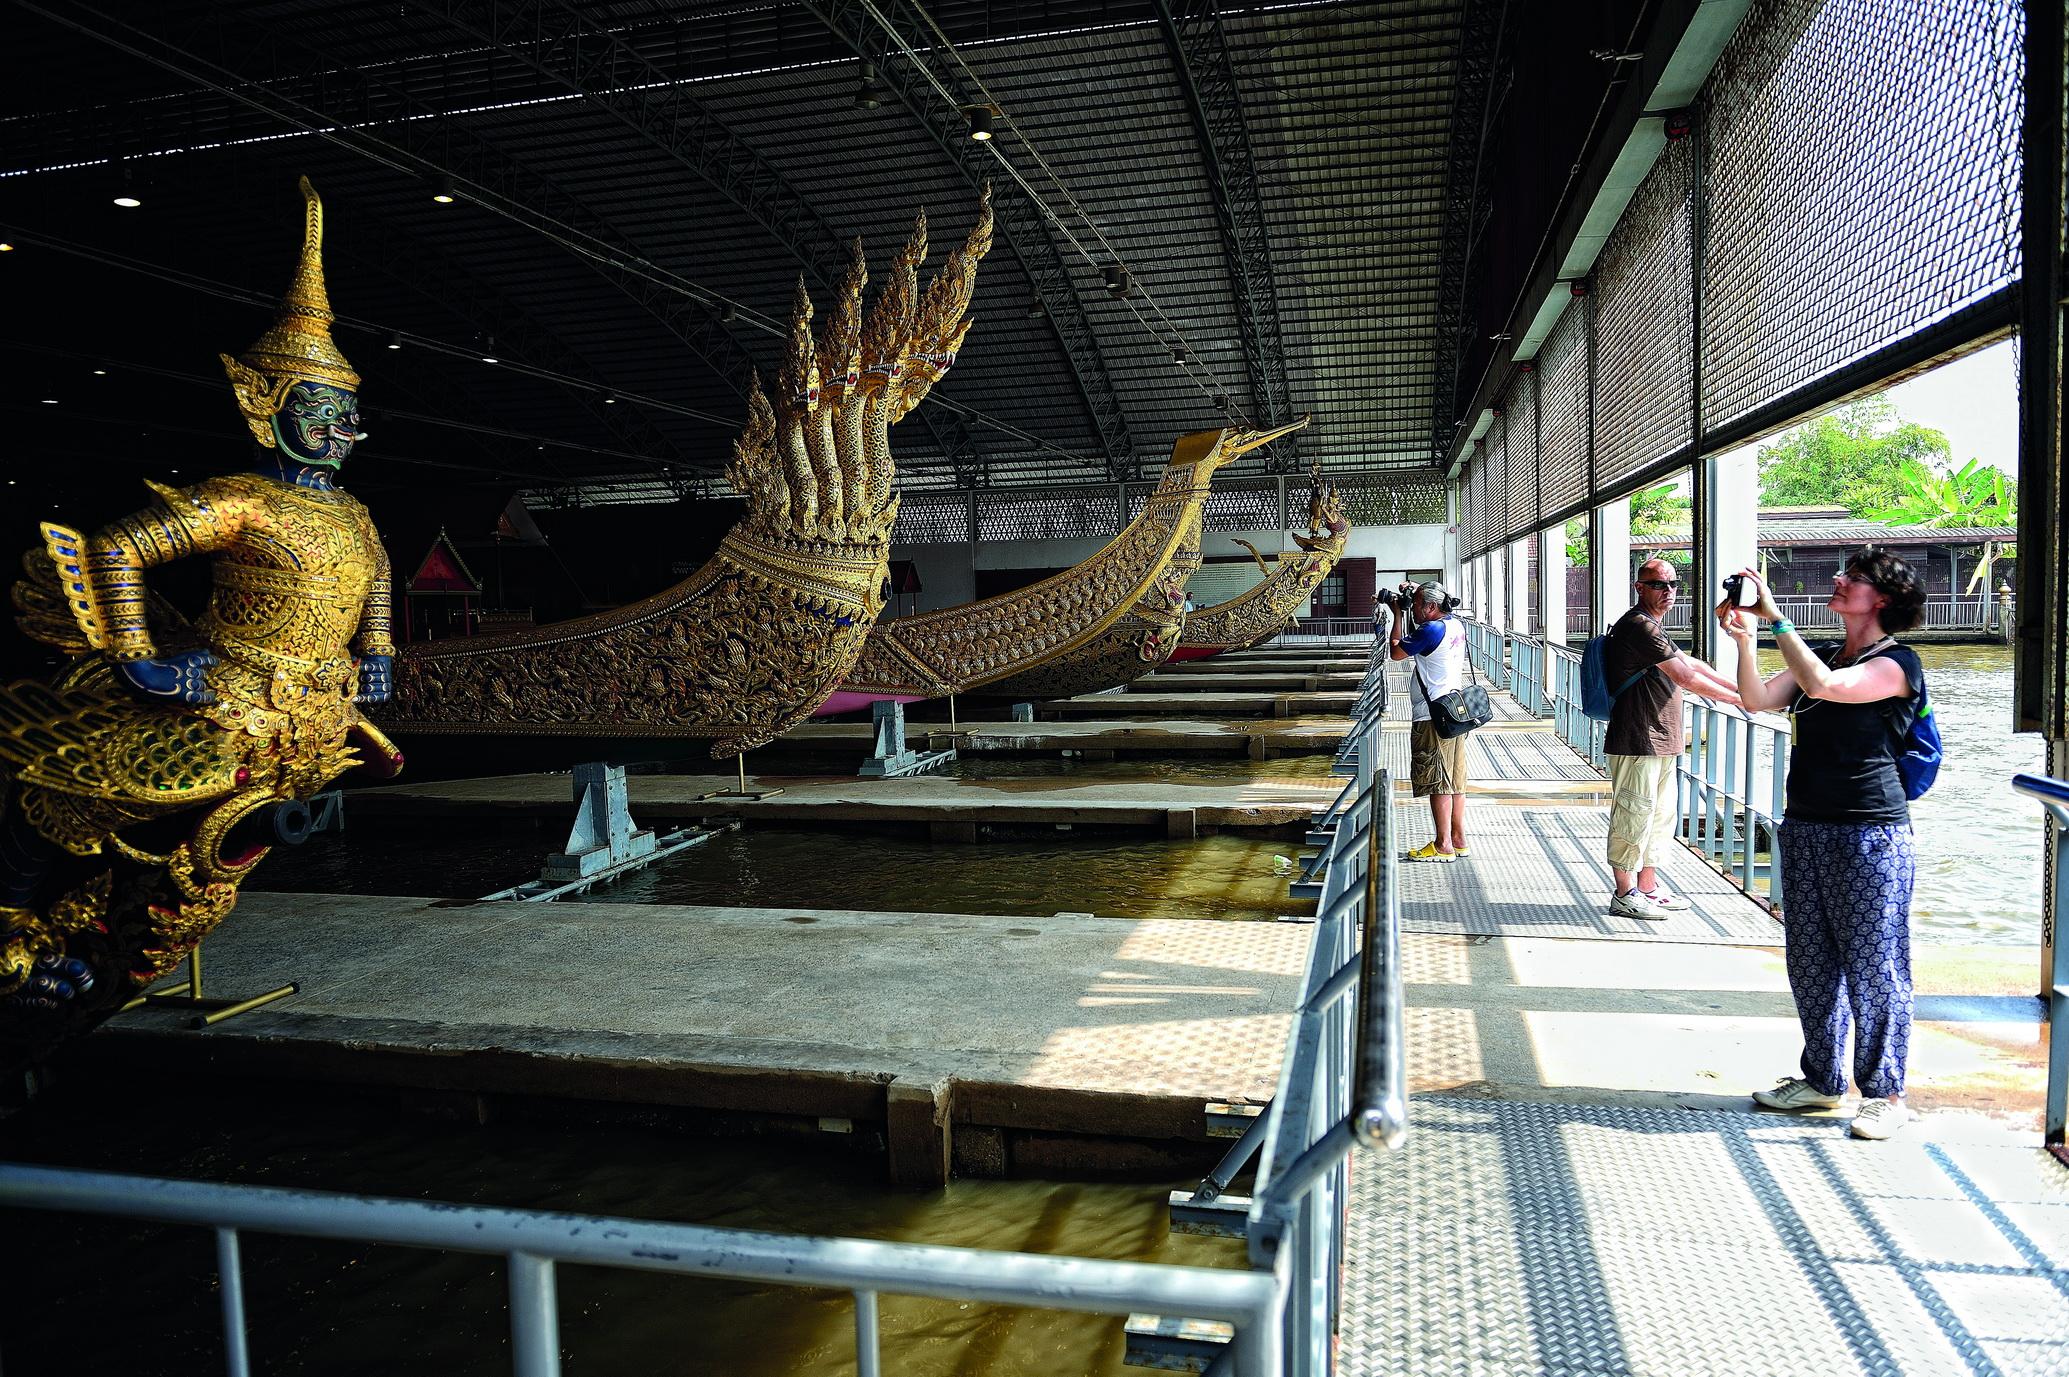 File:Bangkok Royal Barge National Museum 4.jpg - Wikimedia Commons